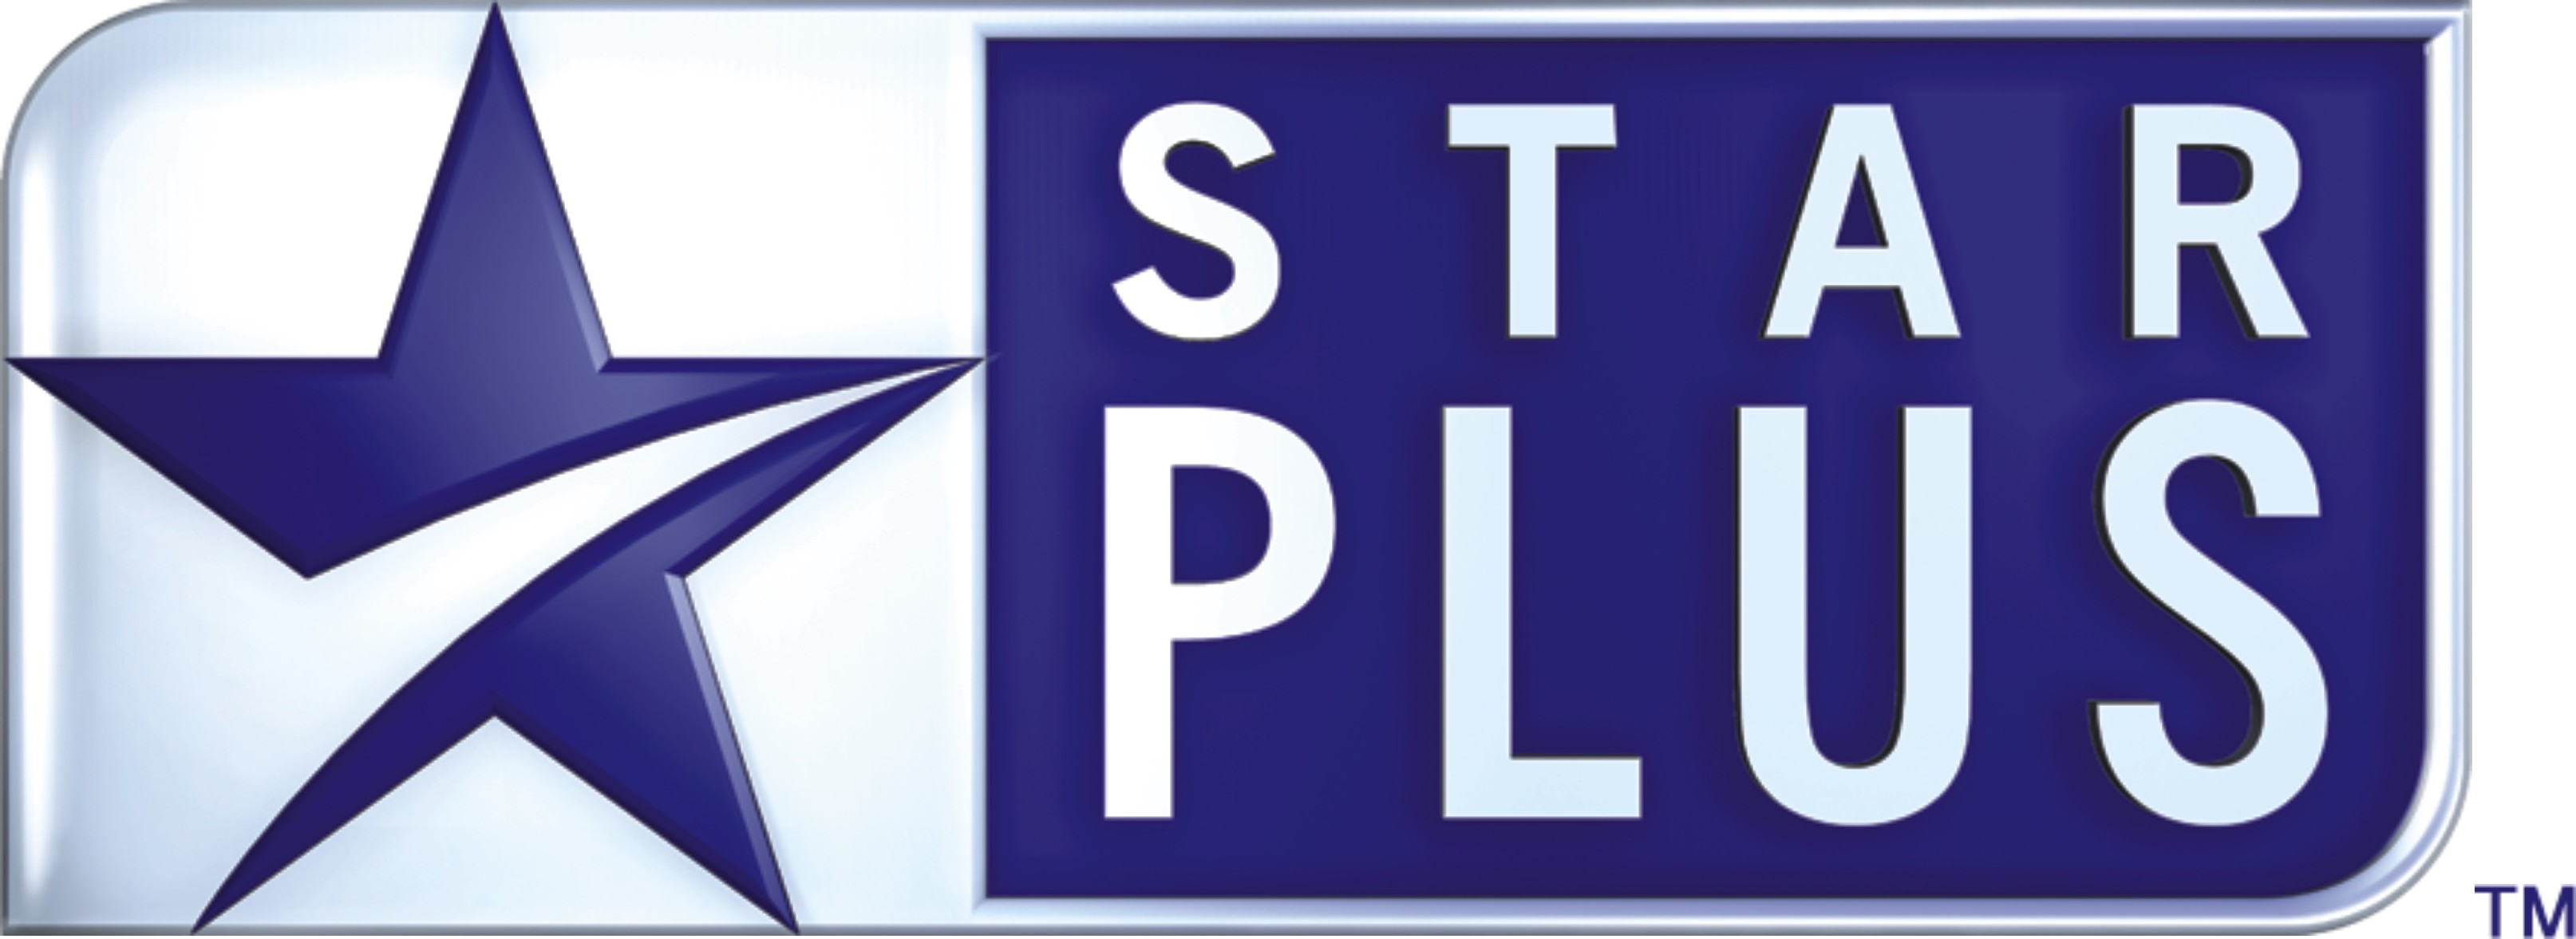 Star Plus logo.png